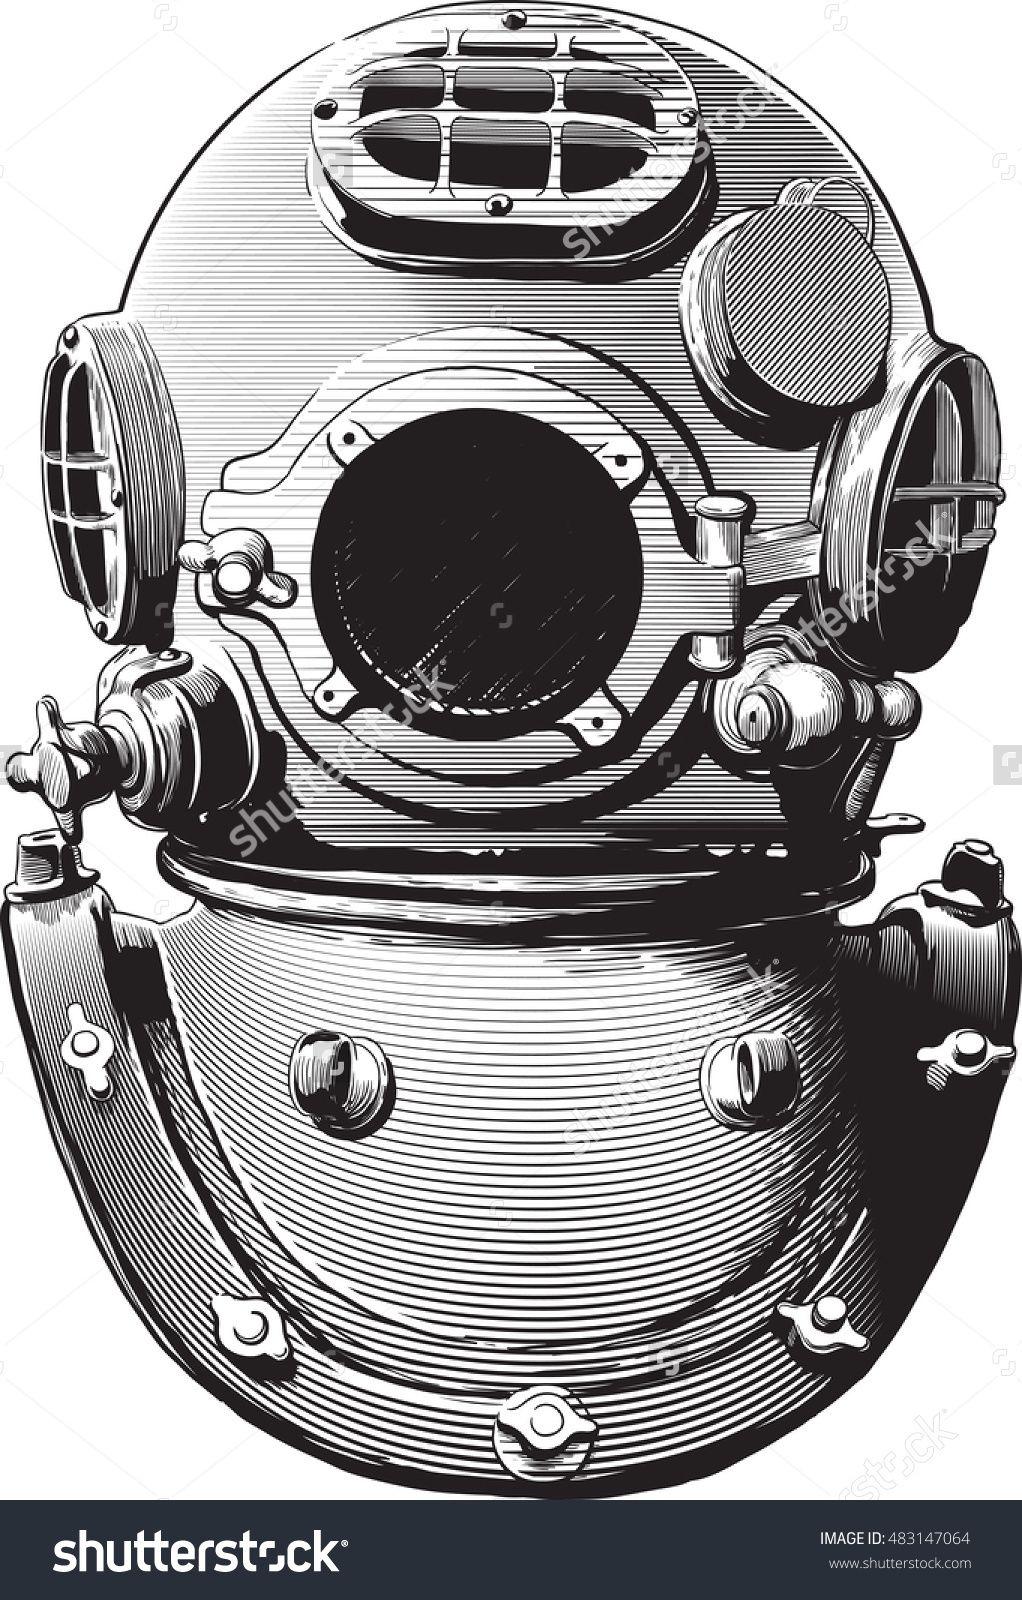 X-Mas Antique Vintage Diving Helmet Brass Divers Maritime Us Navy Mark V C